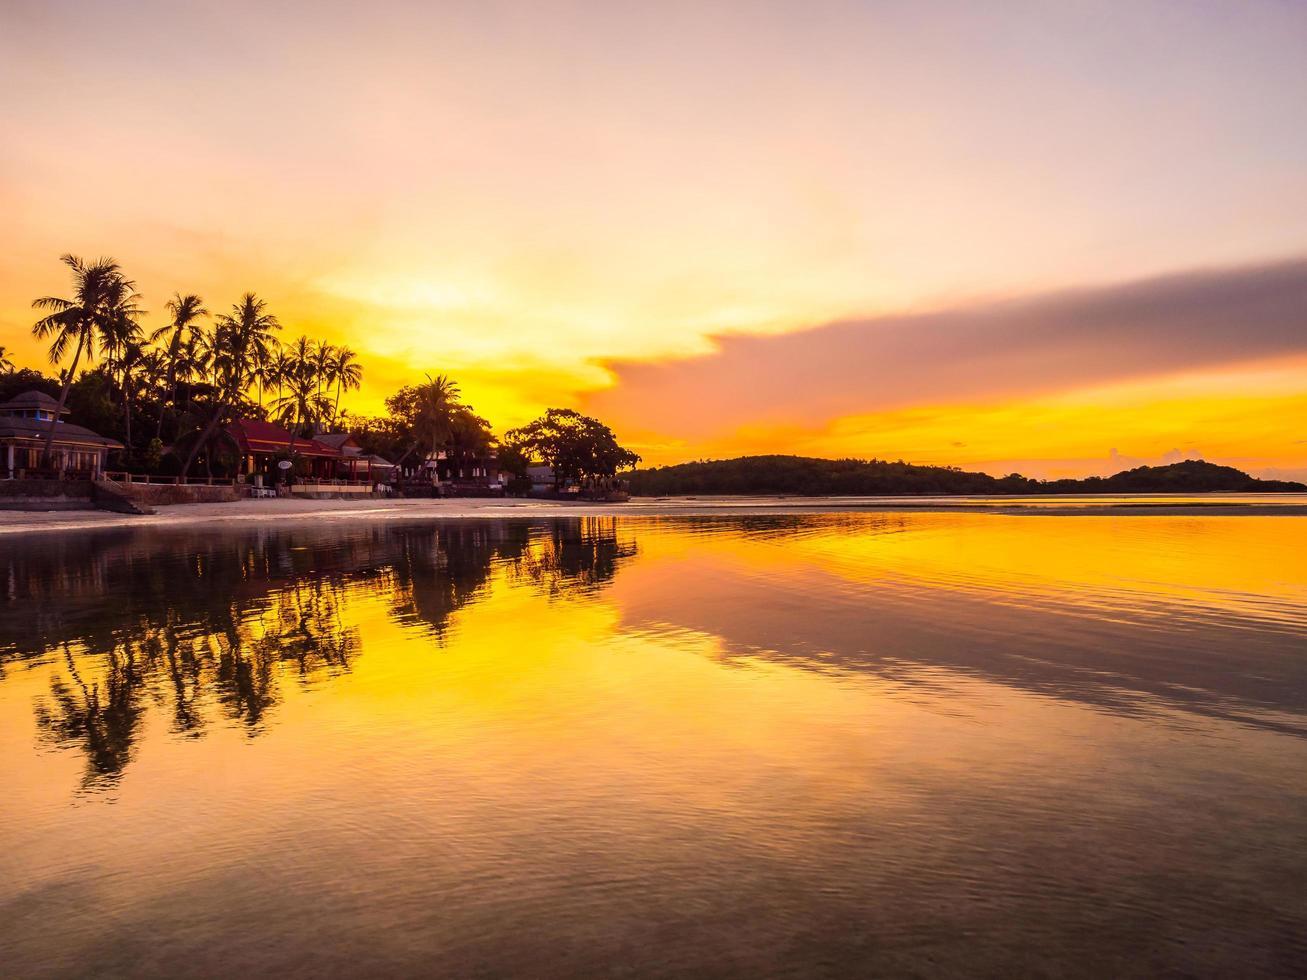 hermosa playa tropical al amanecer foto